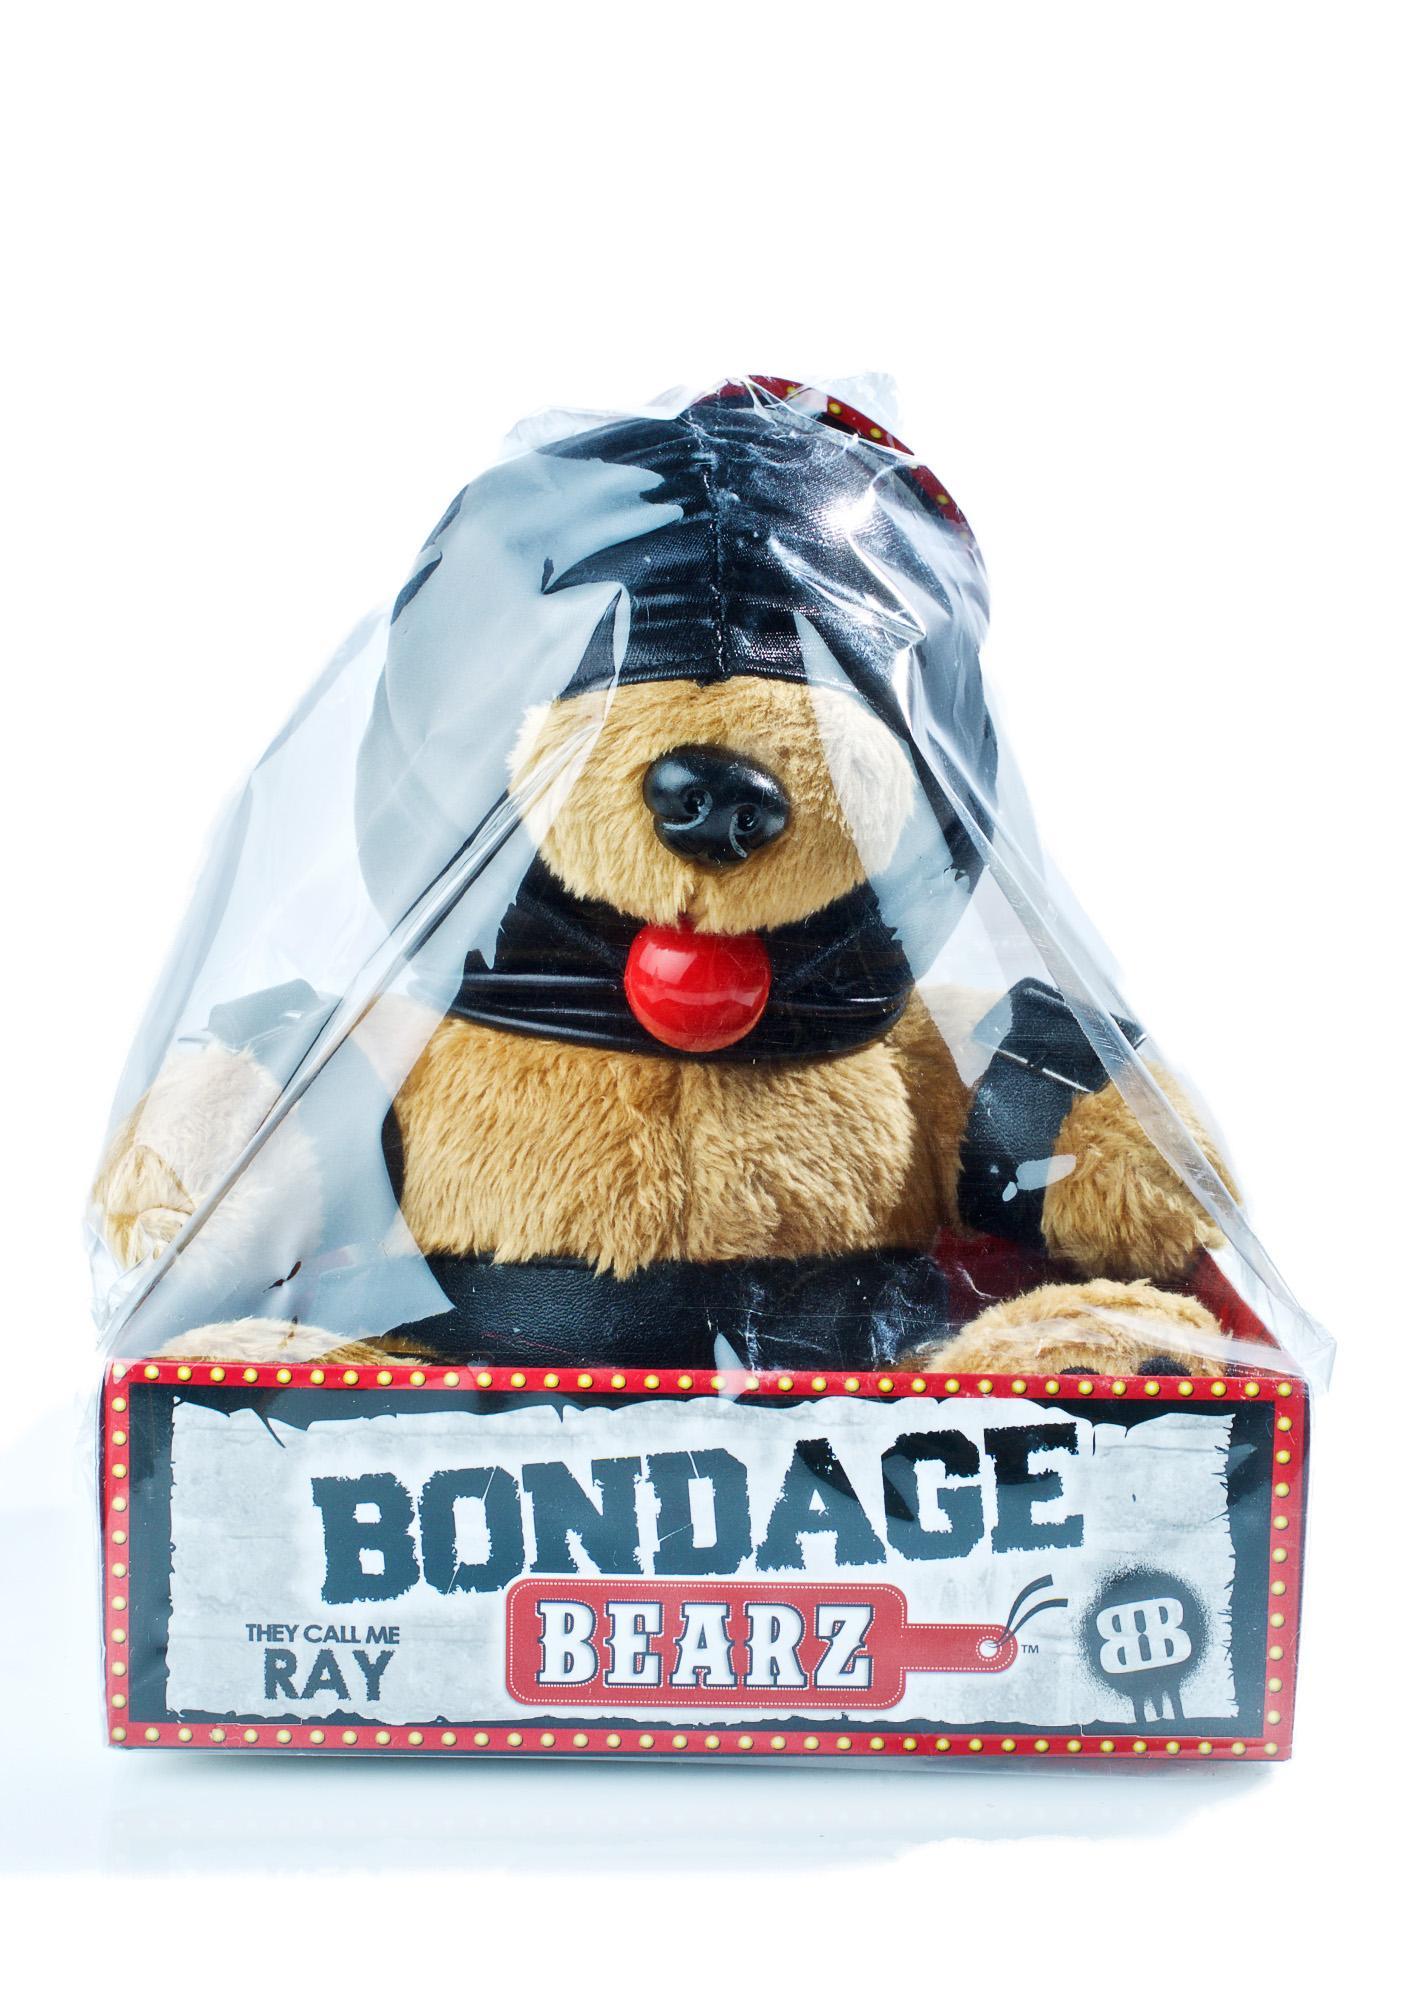 Bondage stuff bears